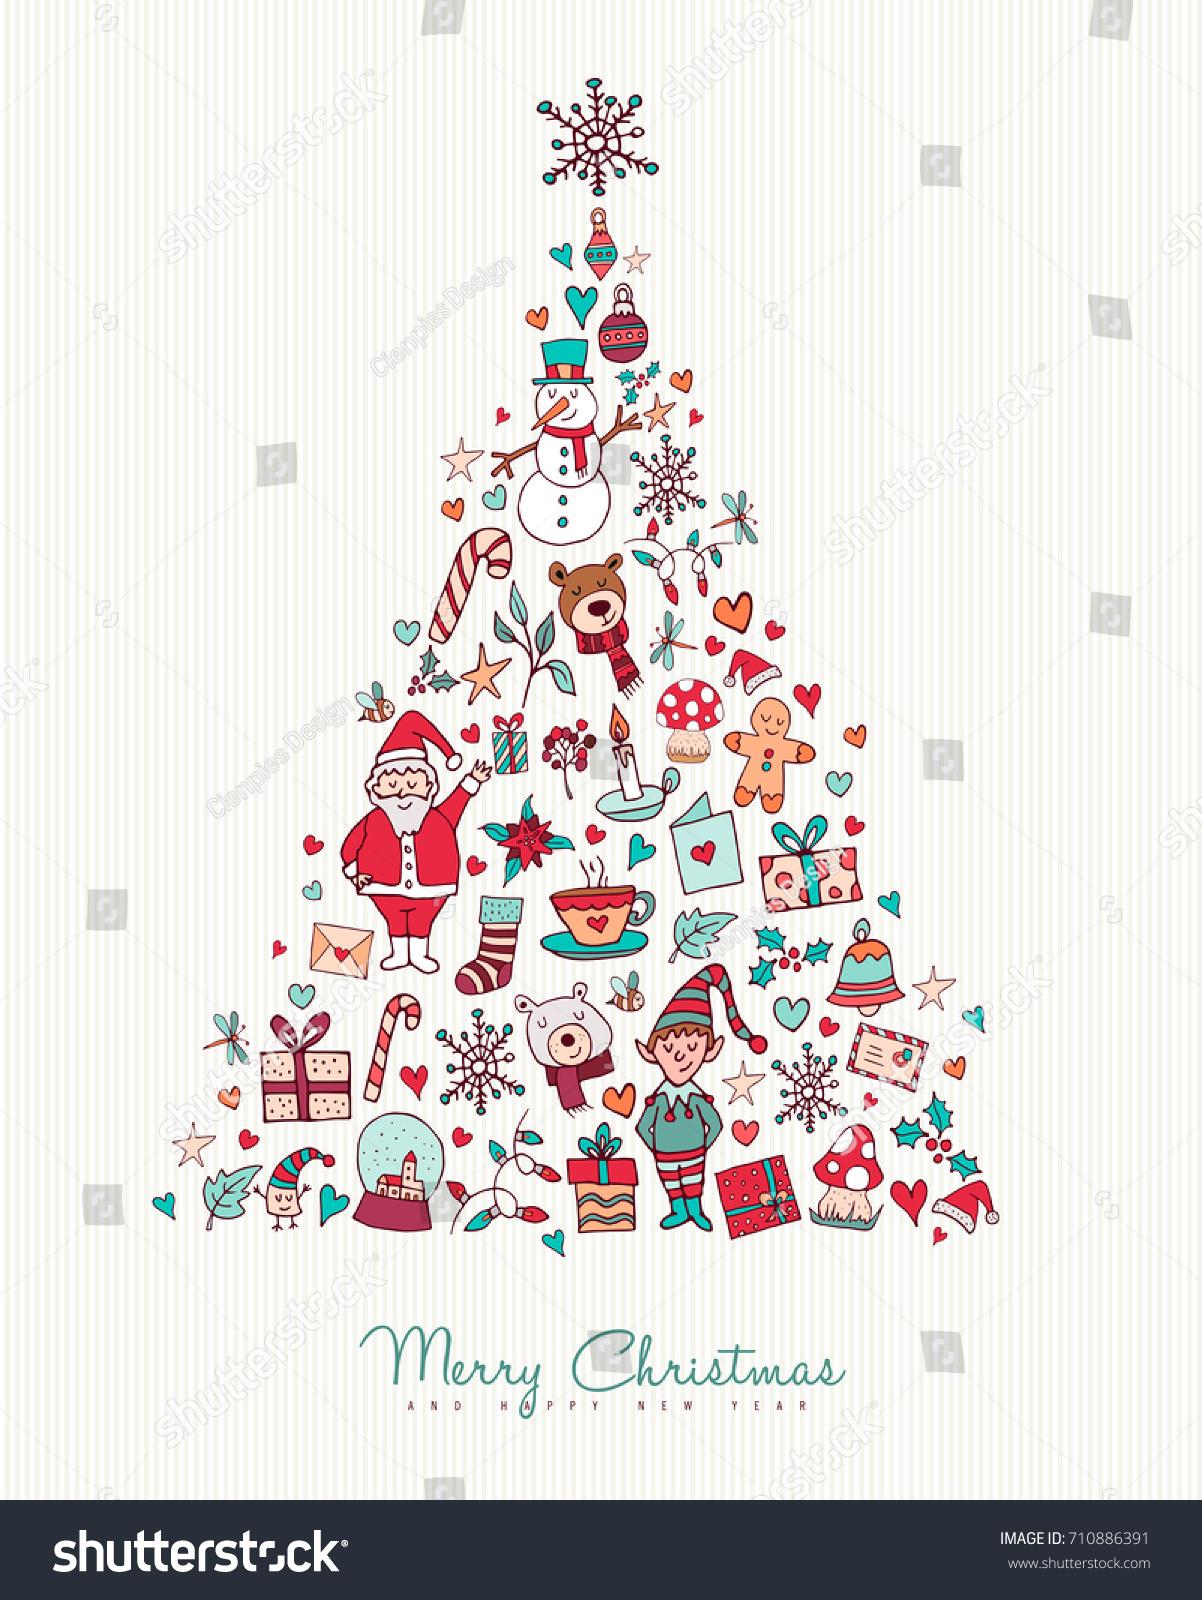 Merry Christmas Happy New Year Hand Stock Vector 710886391 - Shutterstock